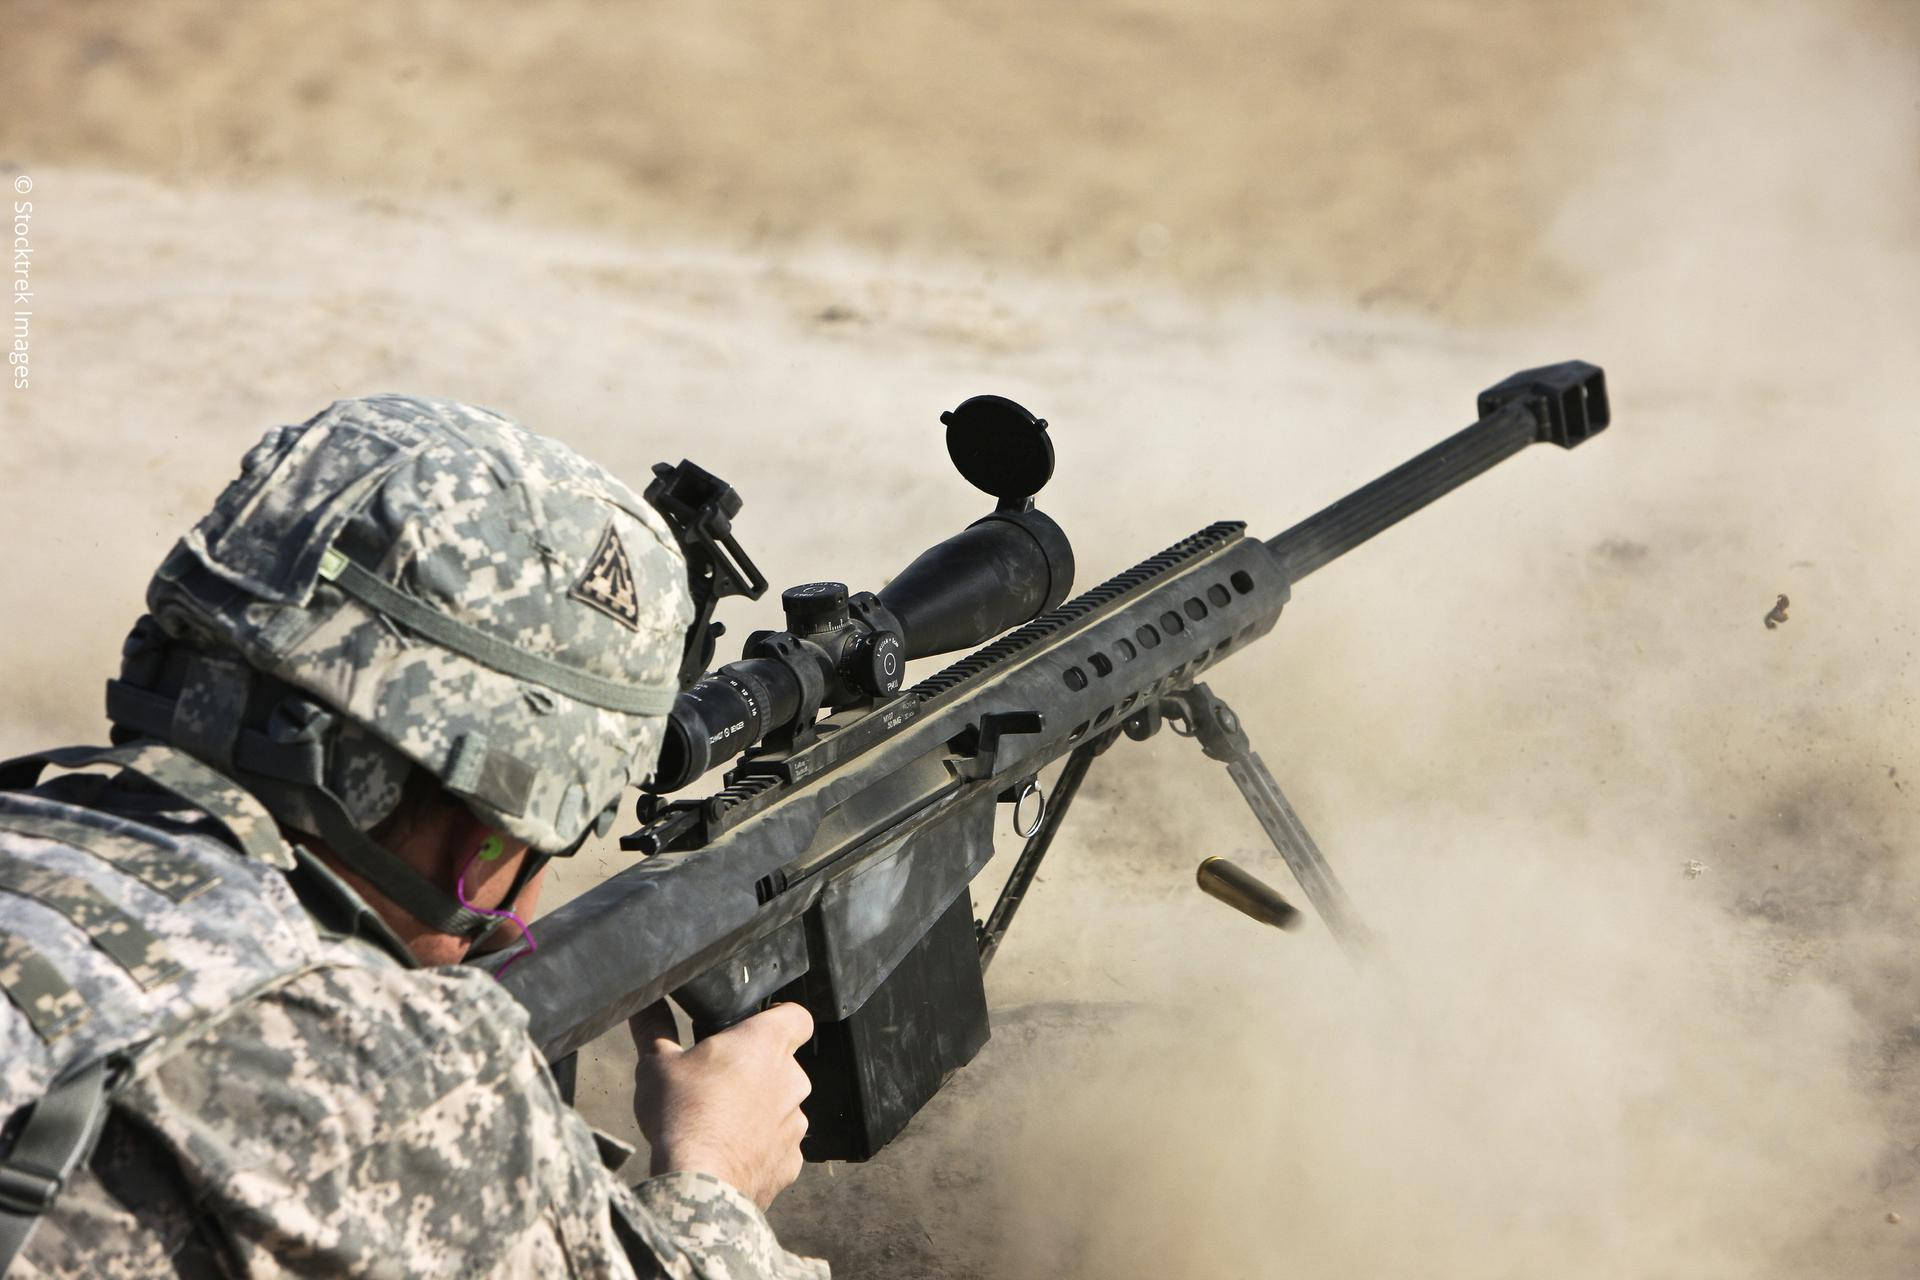 Photograph of a U.S. Army soldier firing a Barrett M82A1 rifle on a firing range, Kunduz, Afghanistan, 2012.